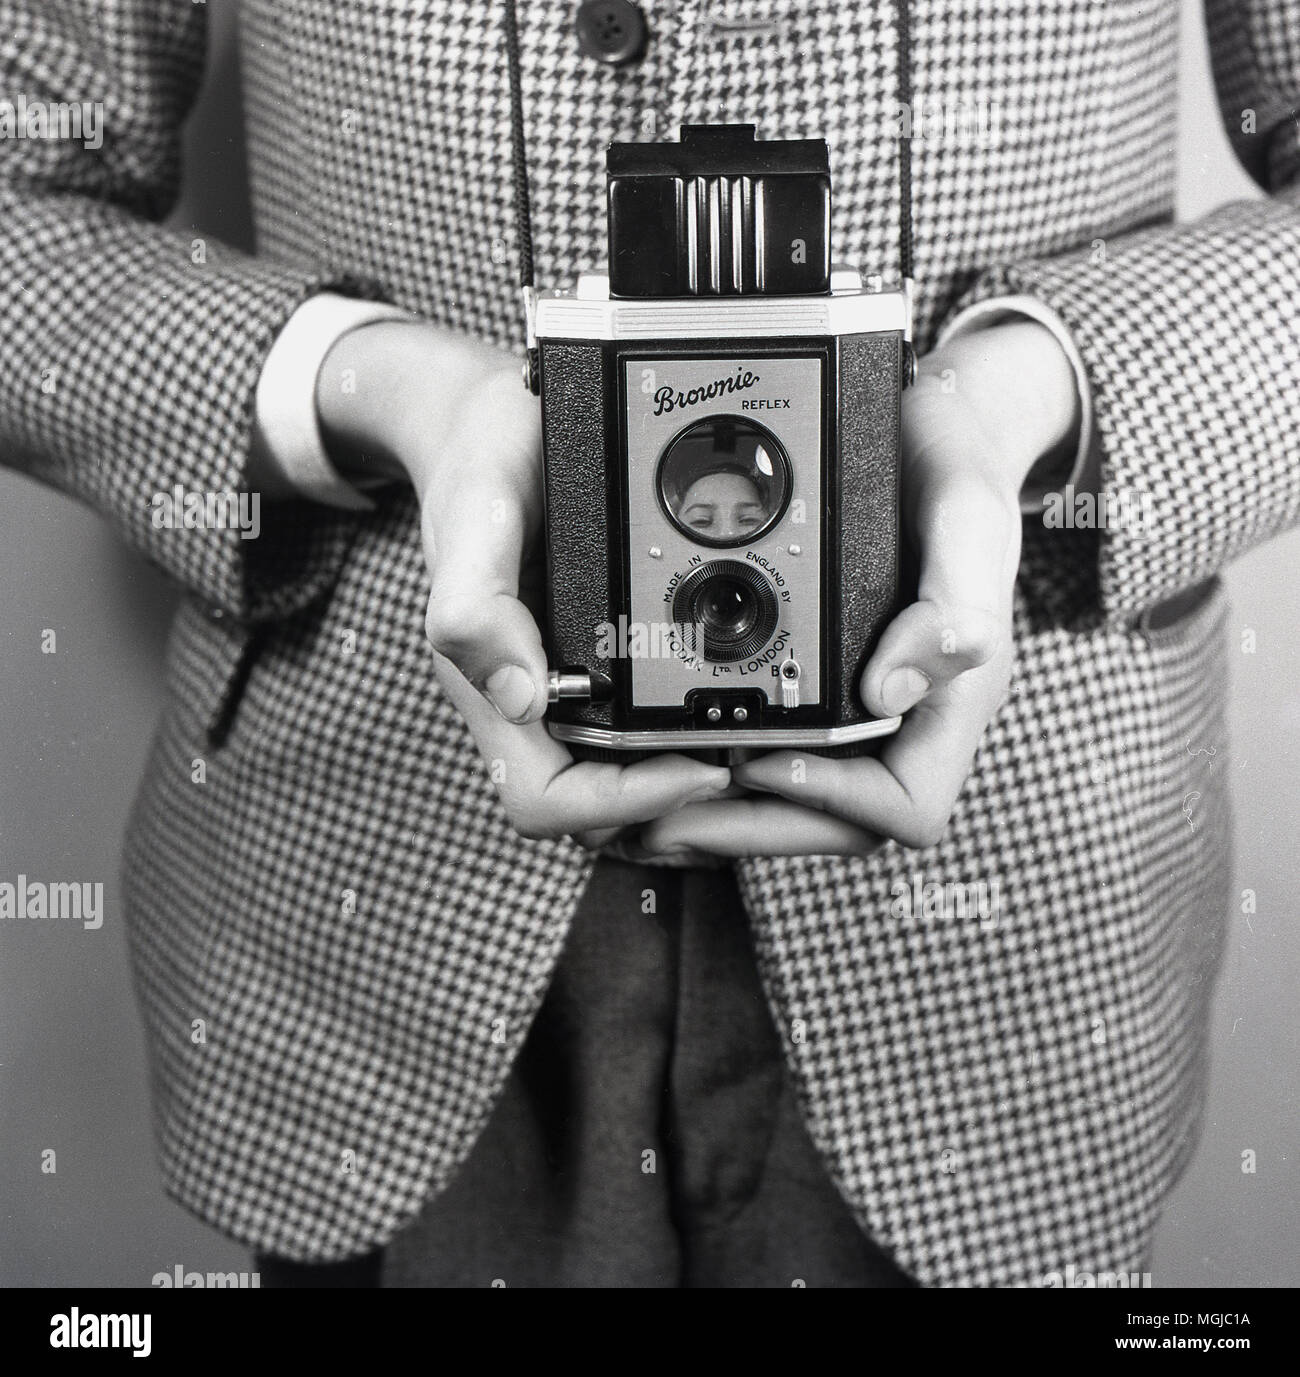 Kodak Film Box Stock Photos & Kodak Film Box Stock Images - Alamy